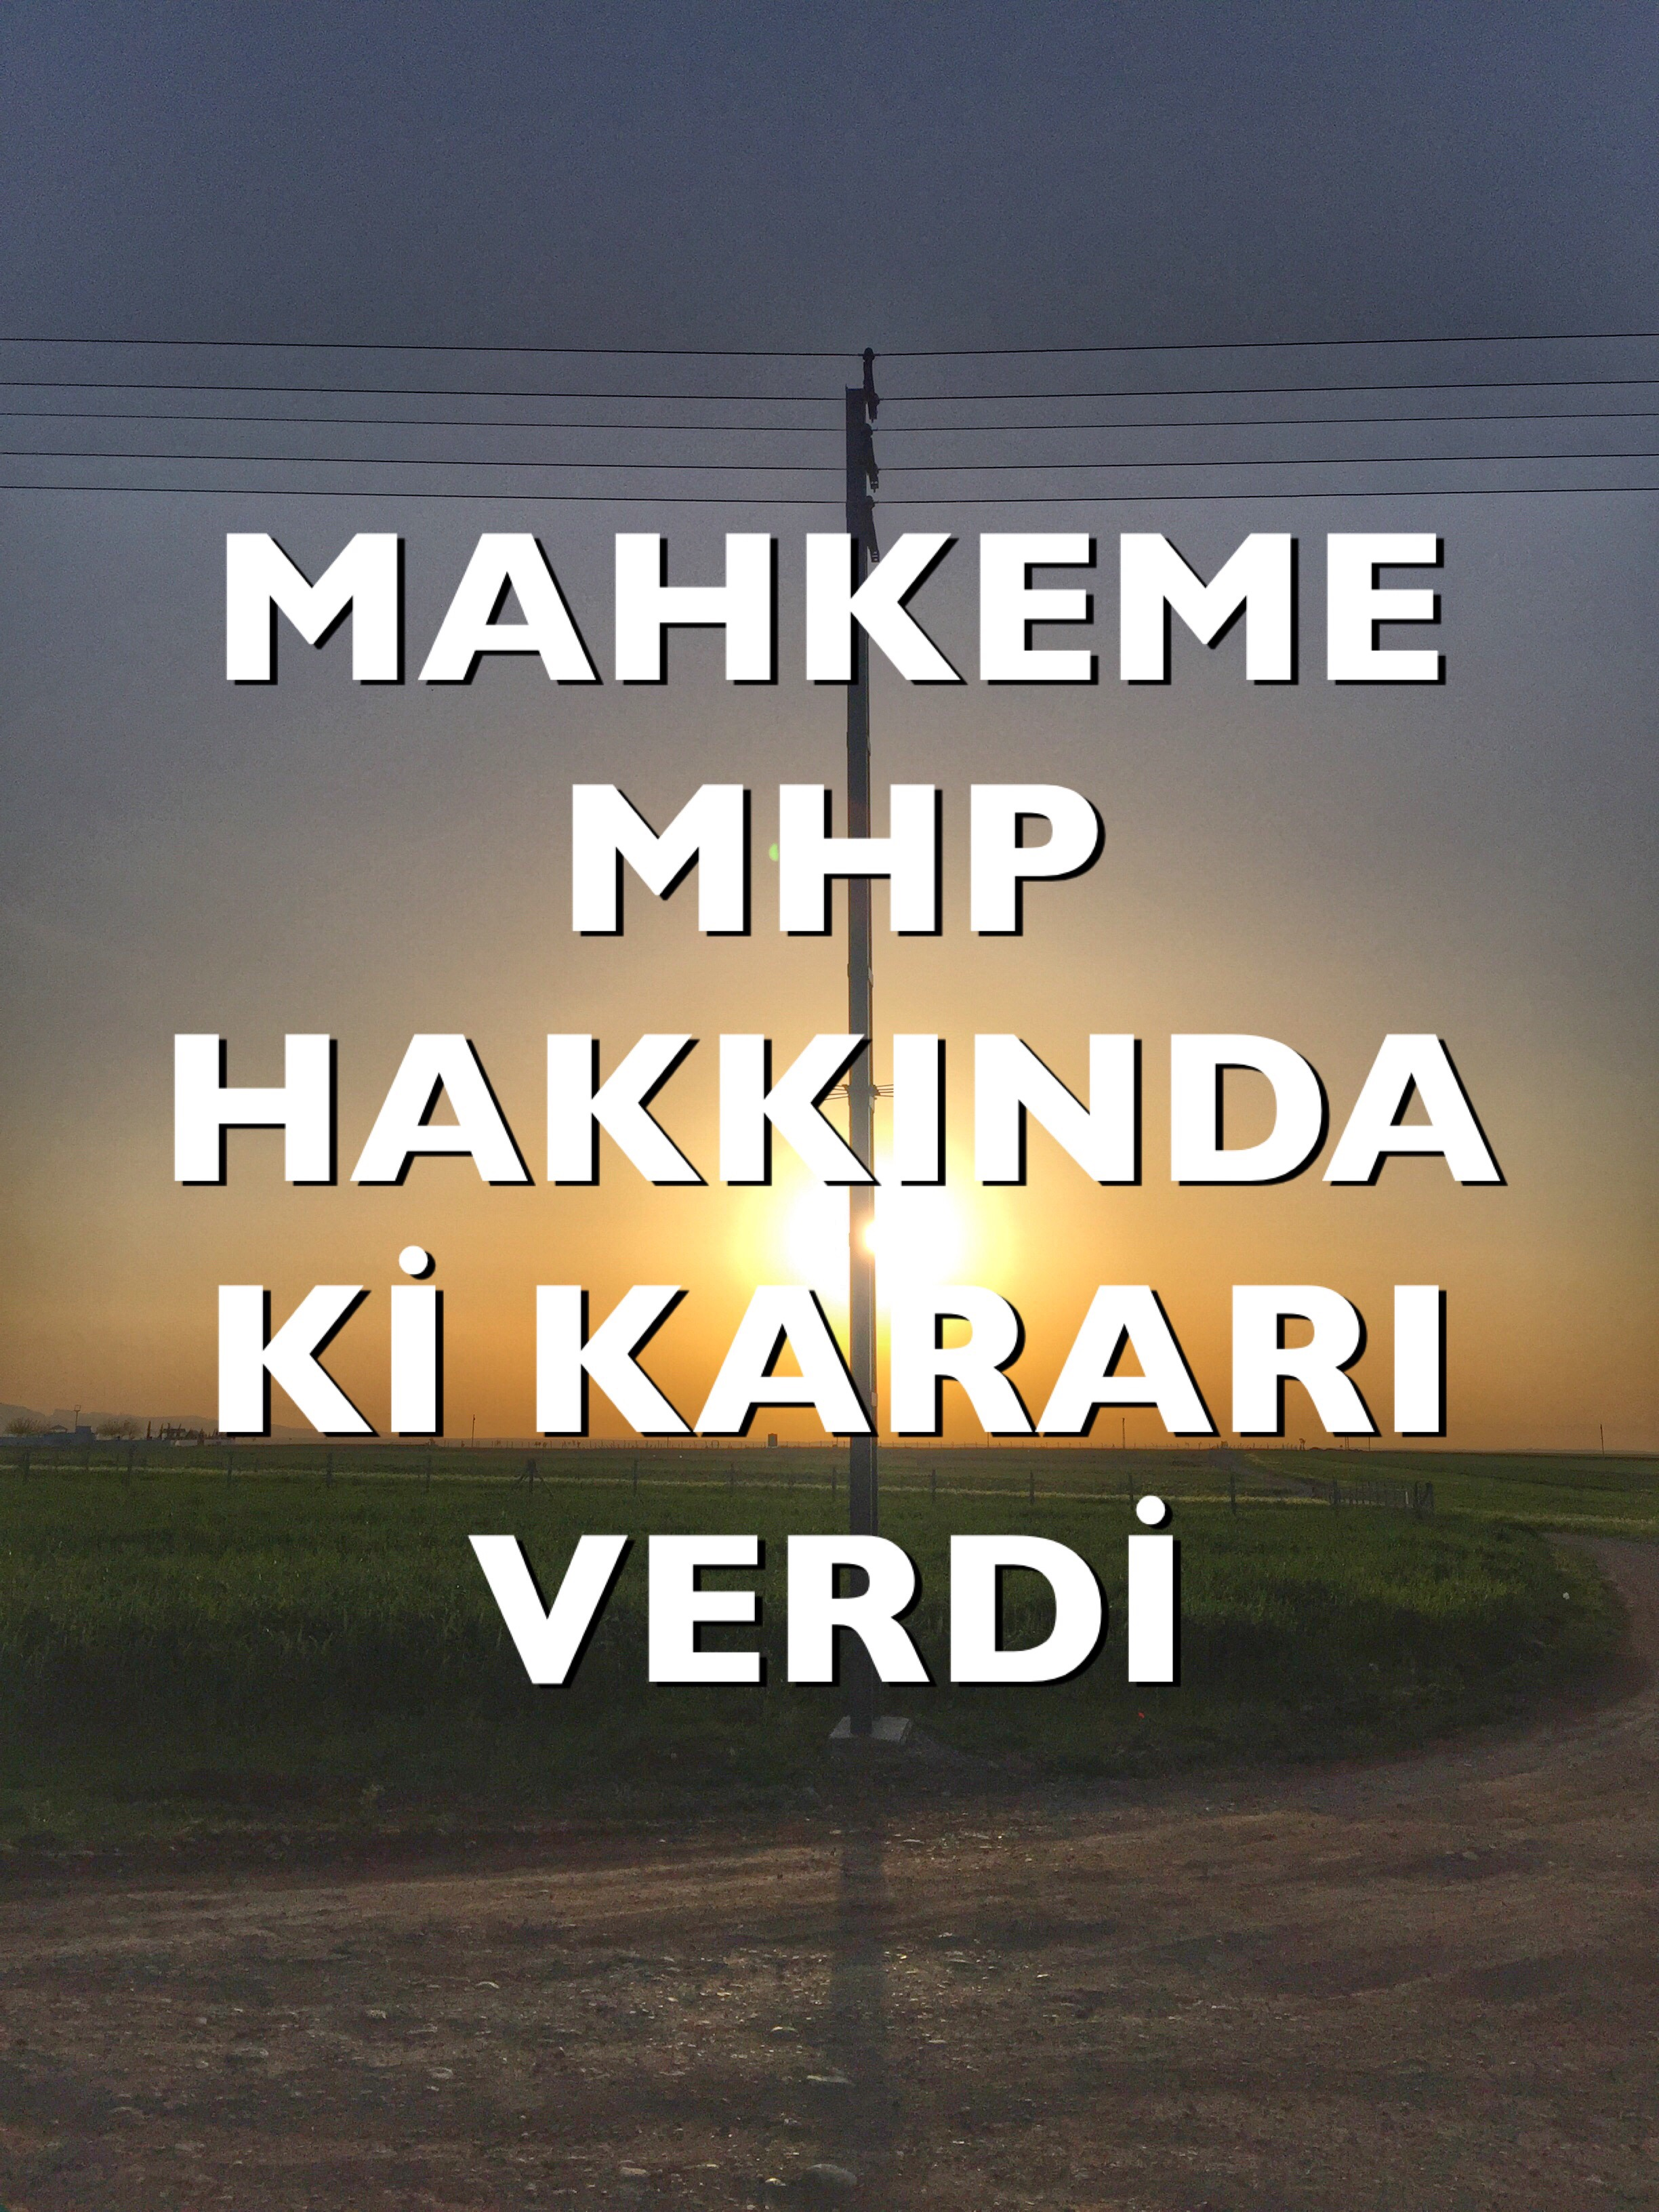 MAHKEME MHP' HAKKINDAKİ KARARINI VERDİ